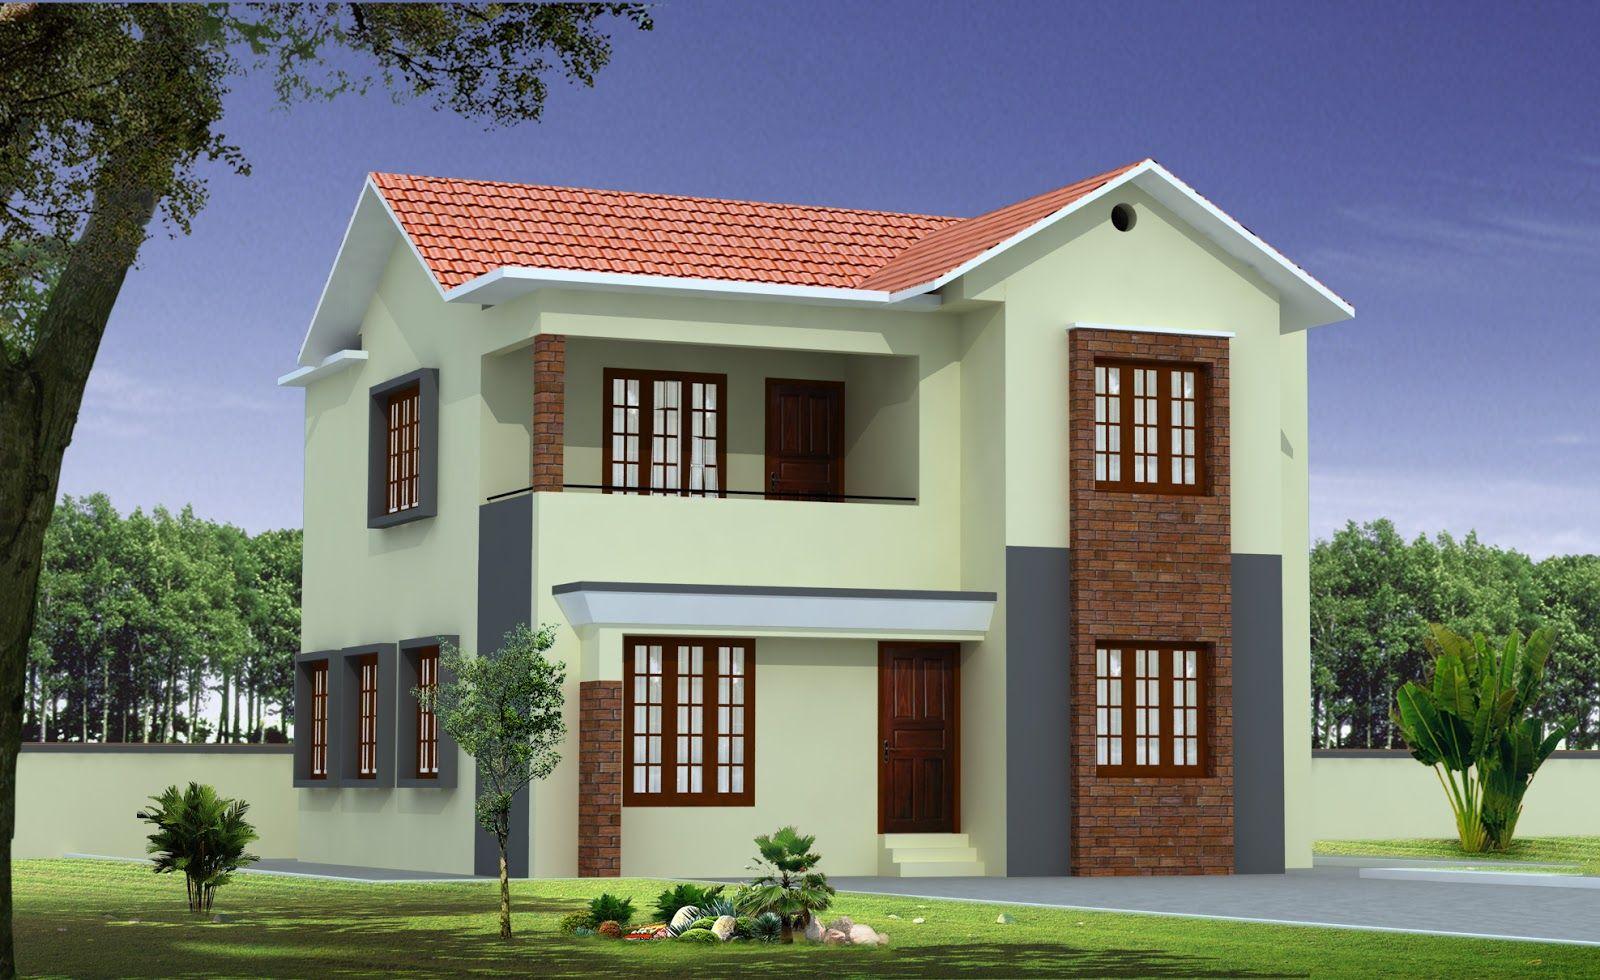 Home Building Design Latest House Designs Building Design